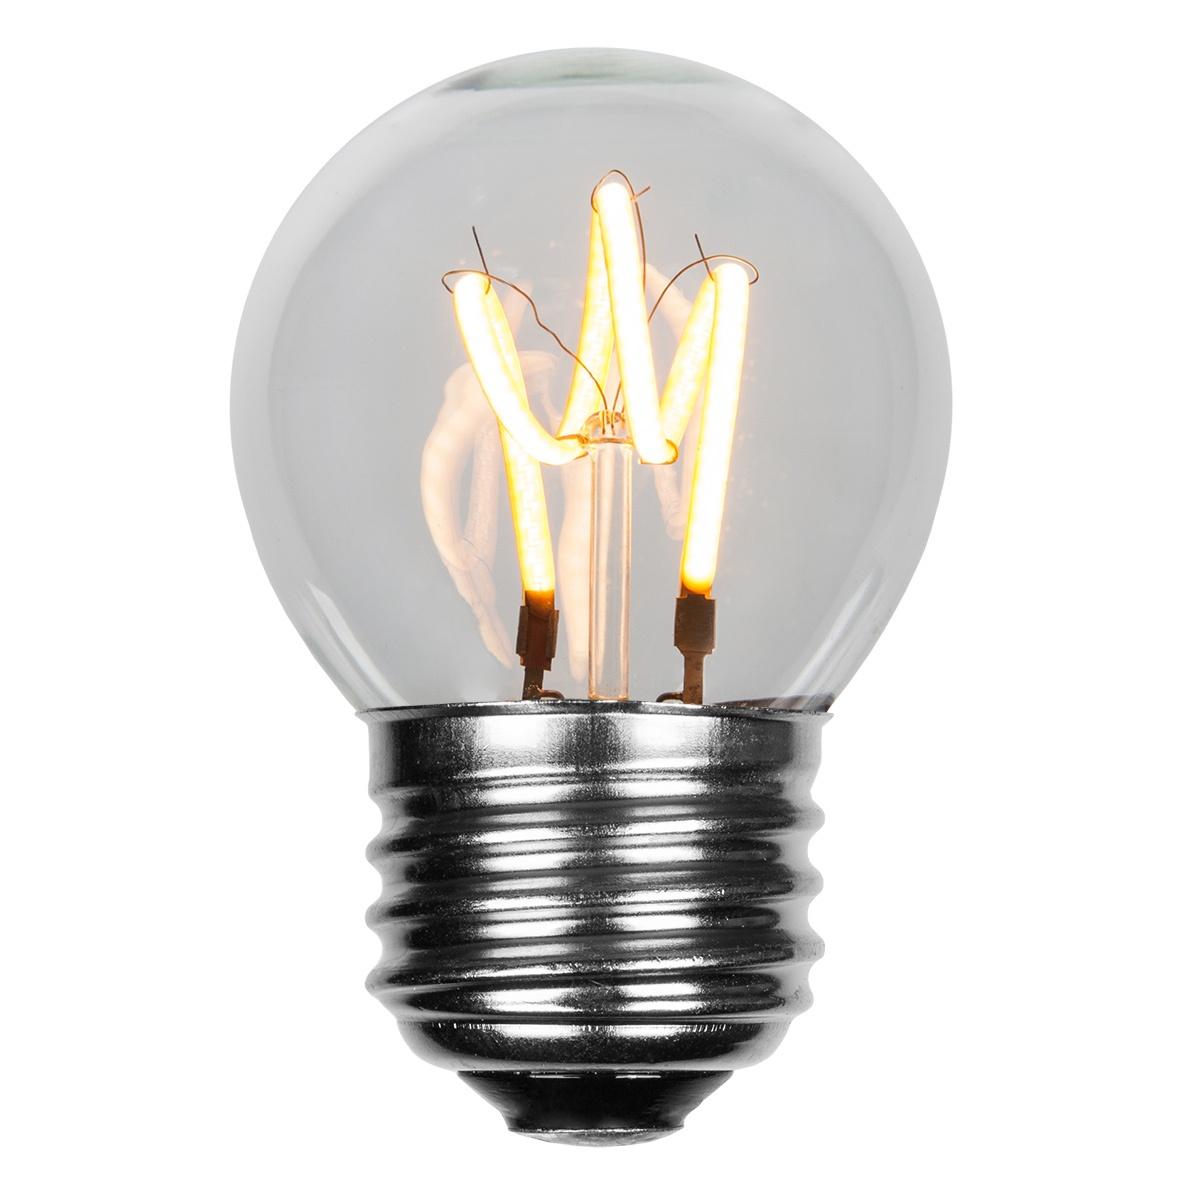 G45 Warm White Led Globe Light Bulbs